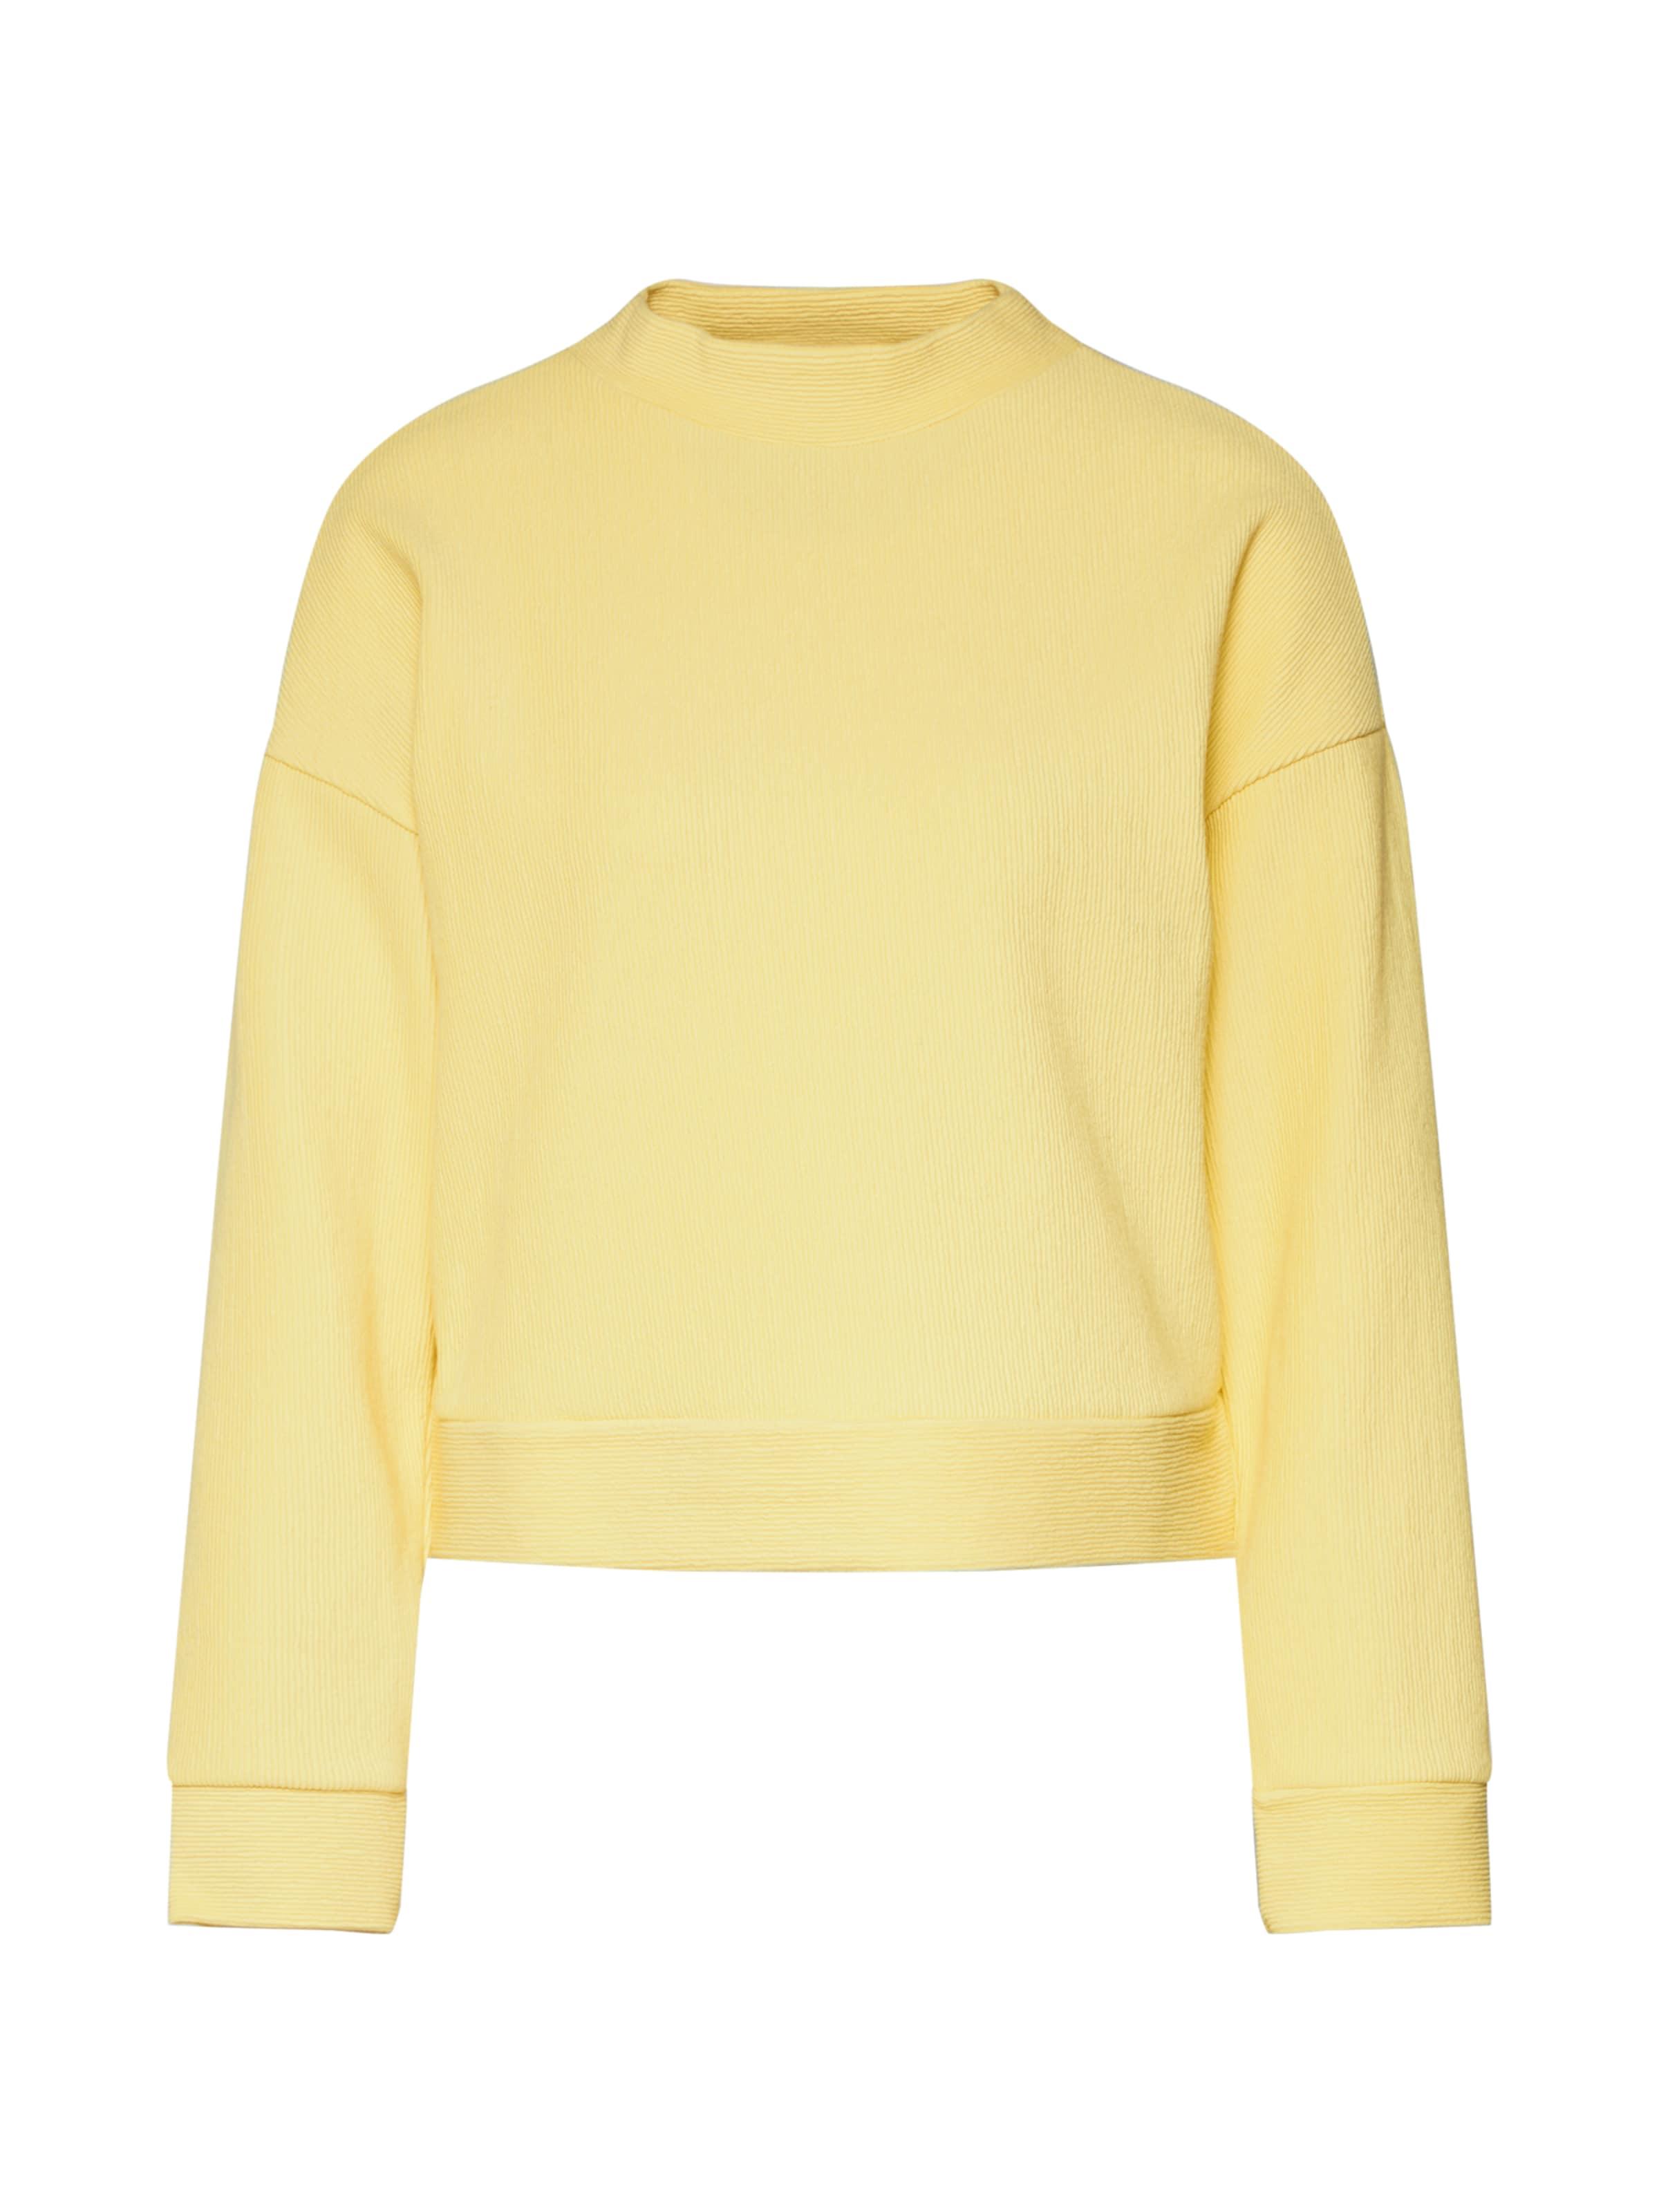 Sweat Jaune Edited shirt 'fidelia' En MzqSVjLUpG